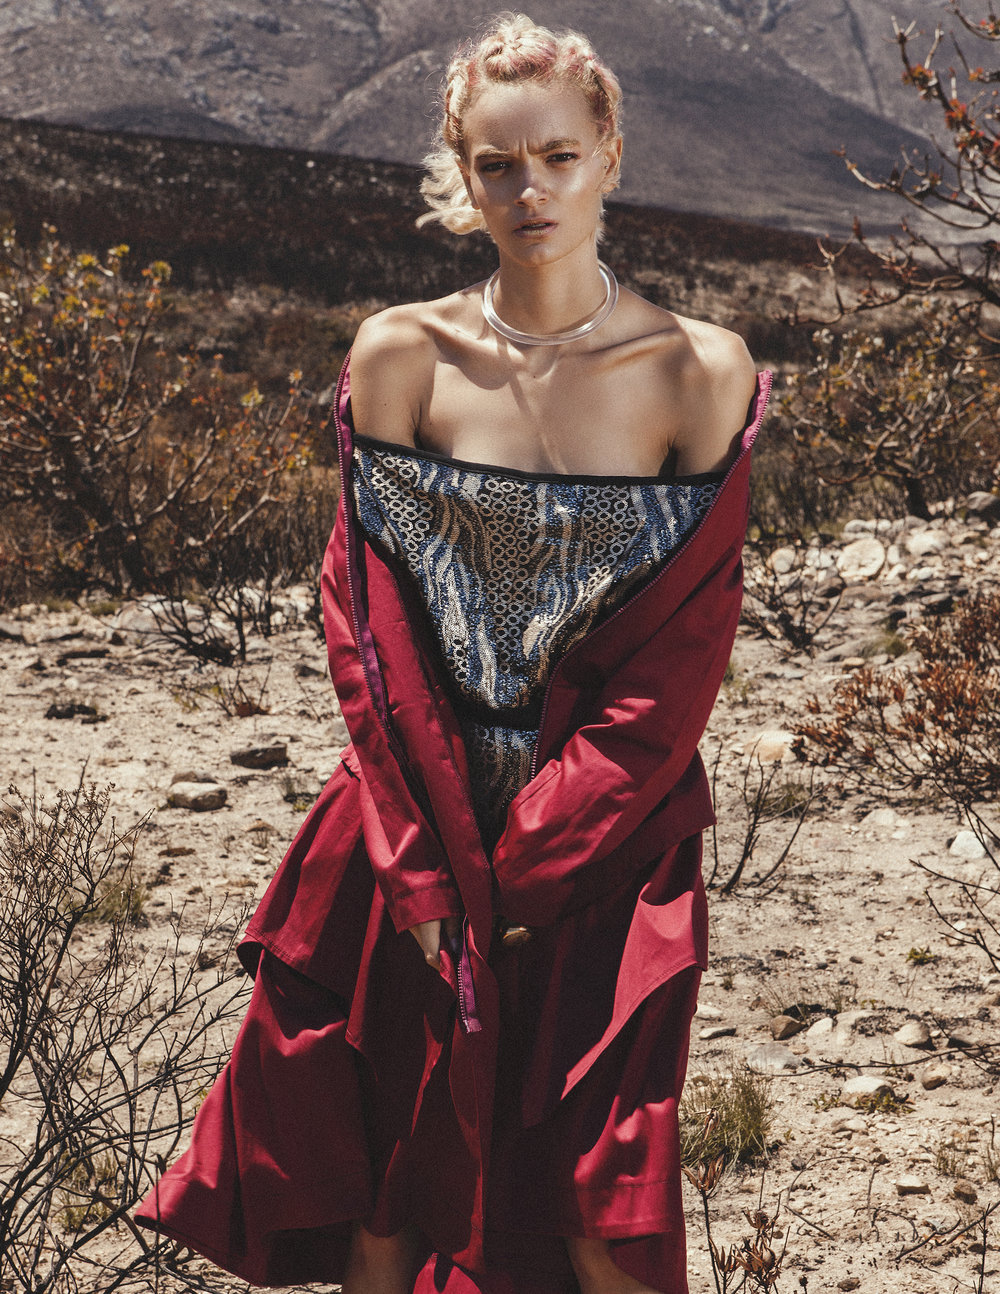 OFF-SHOULDER TOP: Designer Dionne  COAT: Leigh Schubert  NECKPIECE: Philippa Green